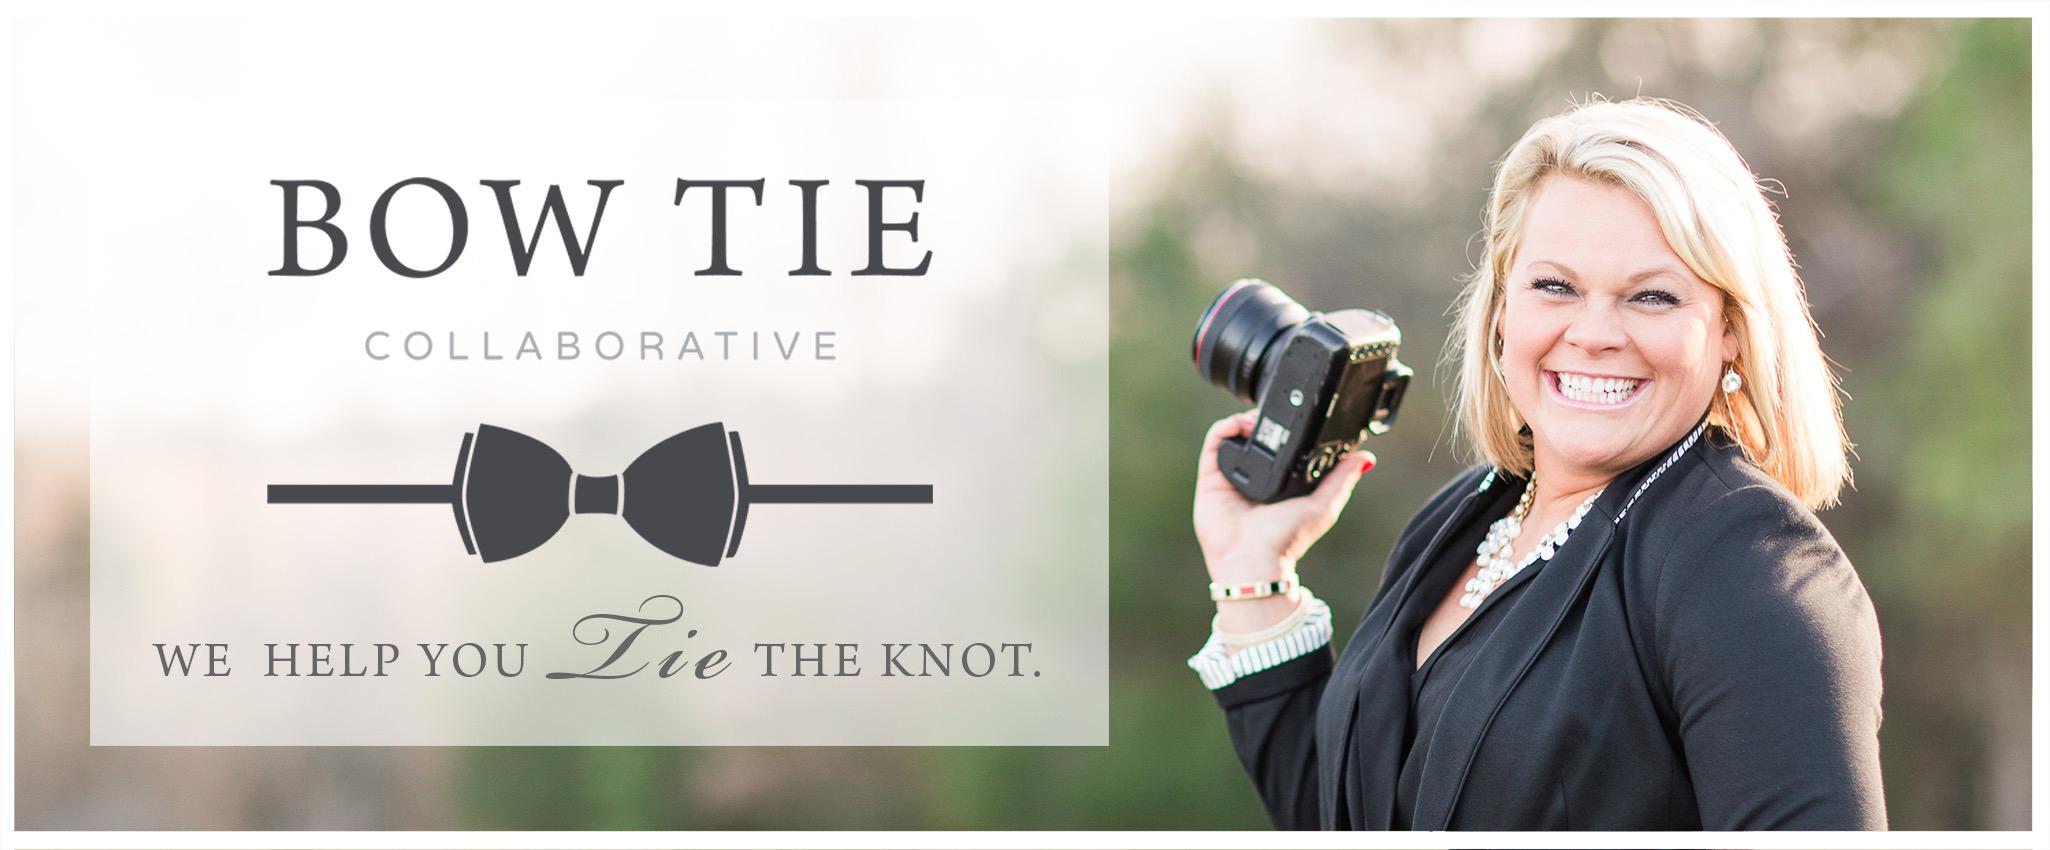 North Carolina Wedding Photographer Bow Tie Collaborative.jpg